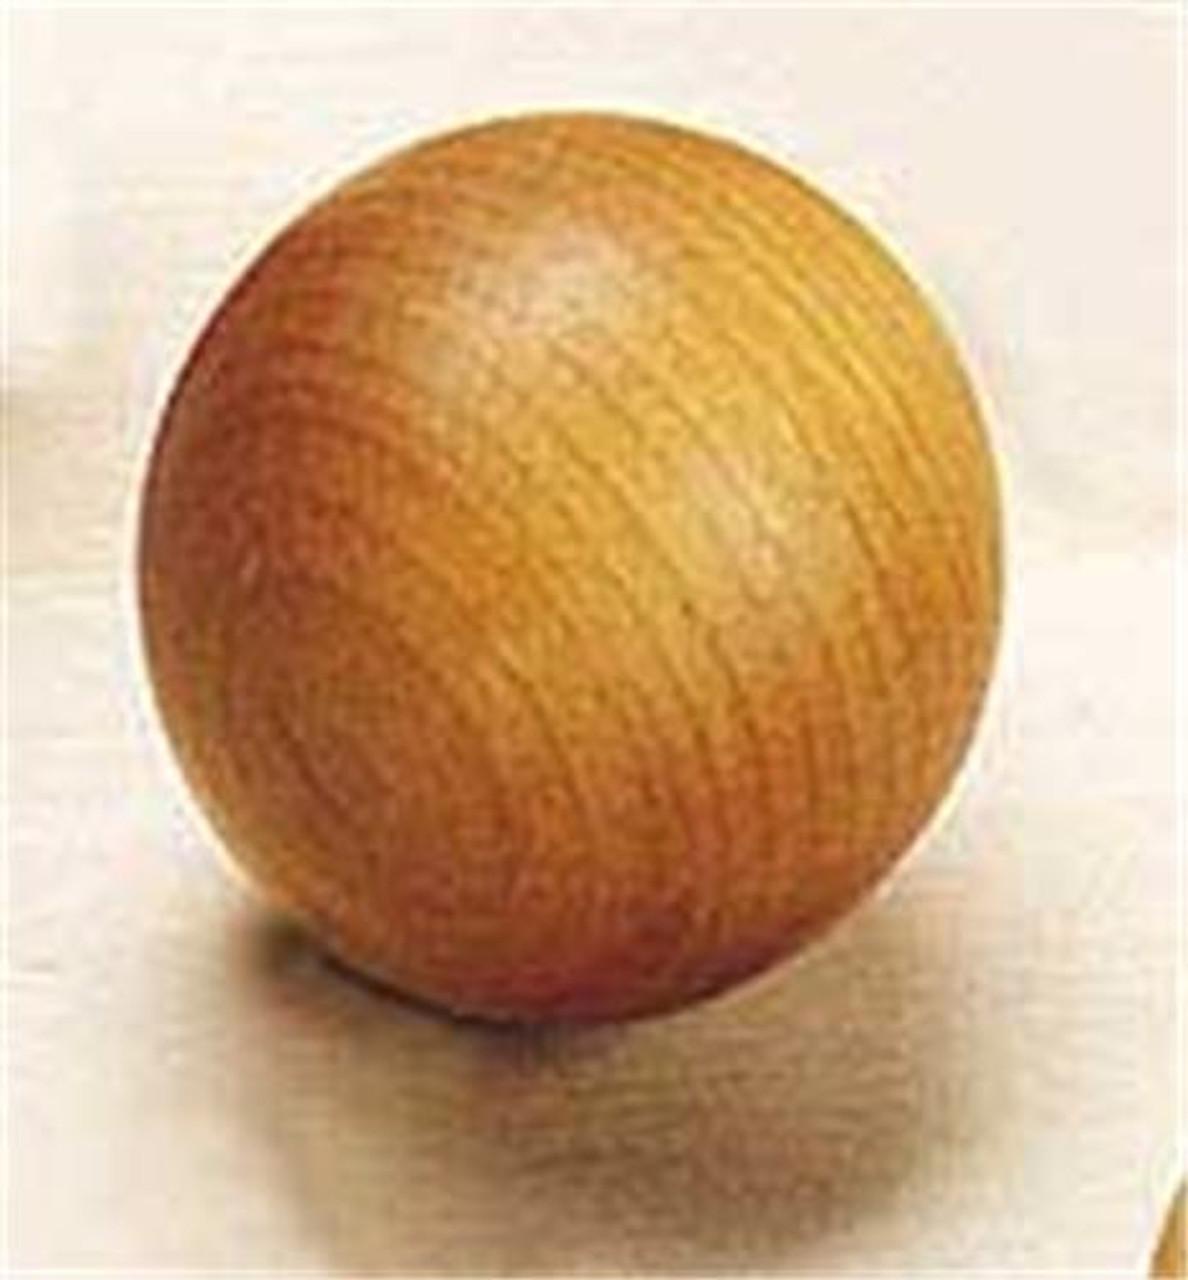 Cherry Tree Toys Wood Ball 2 1/4